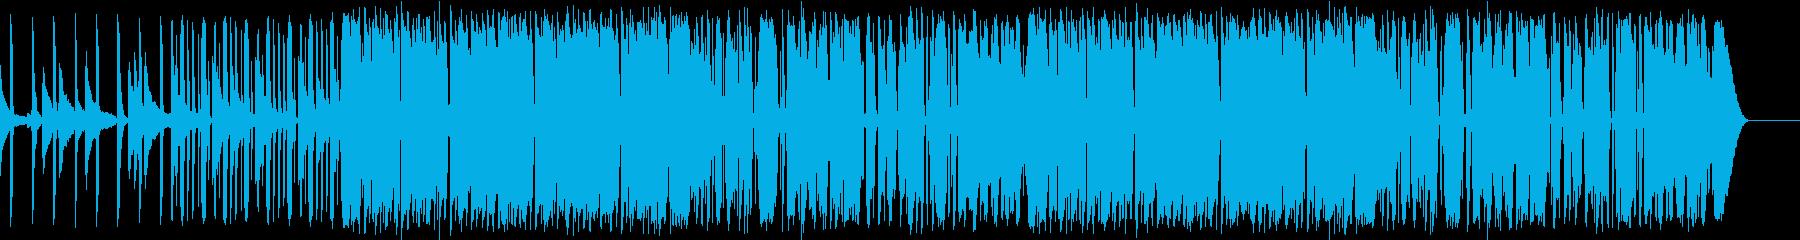 Jazz funk 01の再生済みの波形